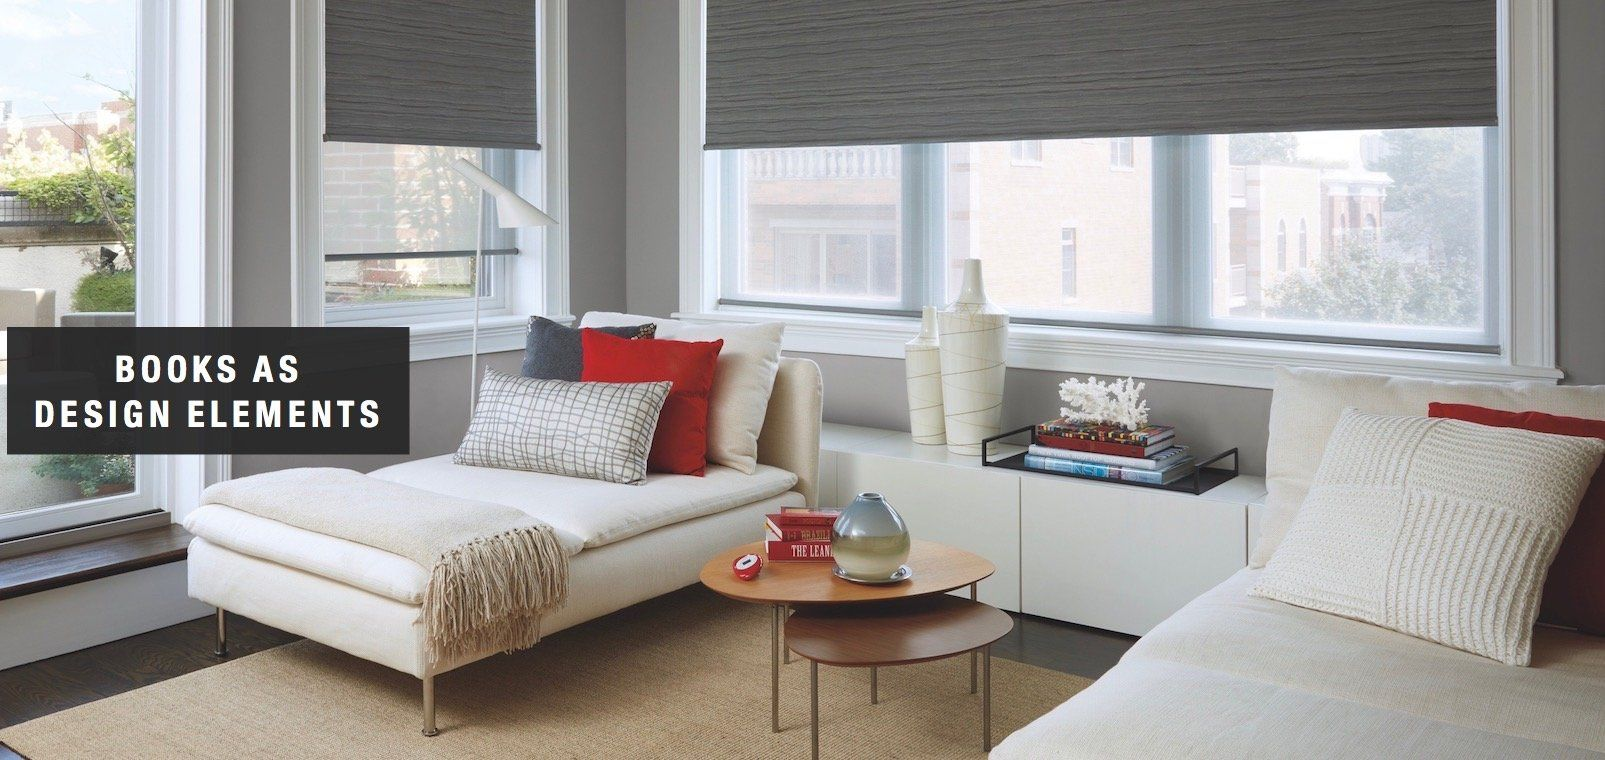 Window treatment ideas for a sunroom  books as design elements  design ideas from peninsula window